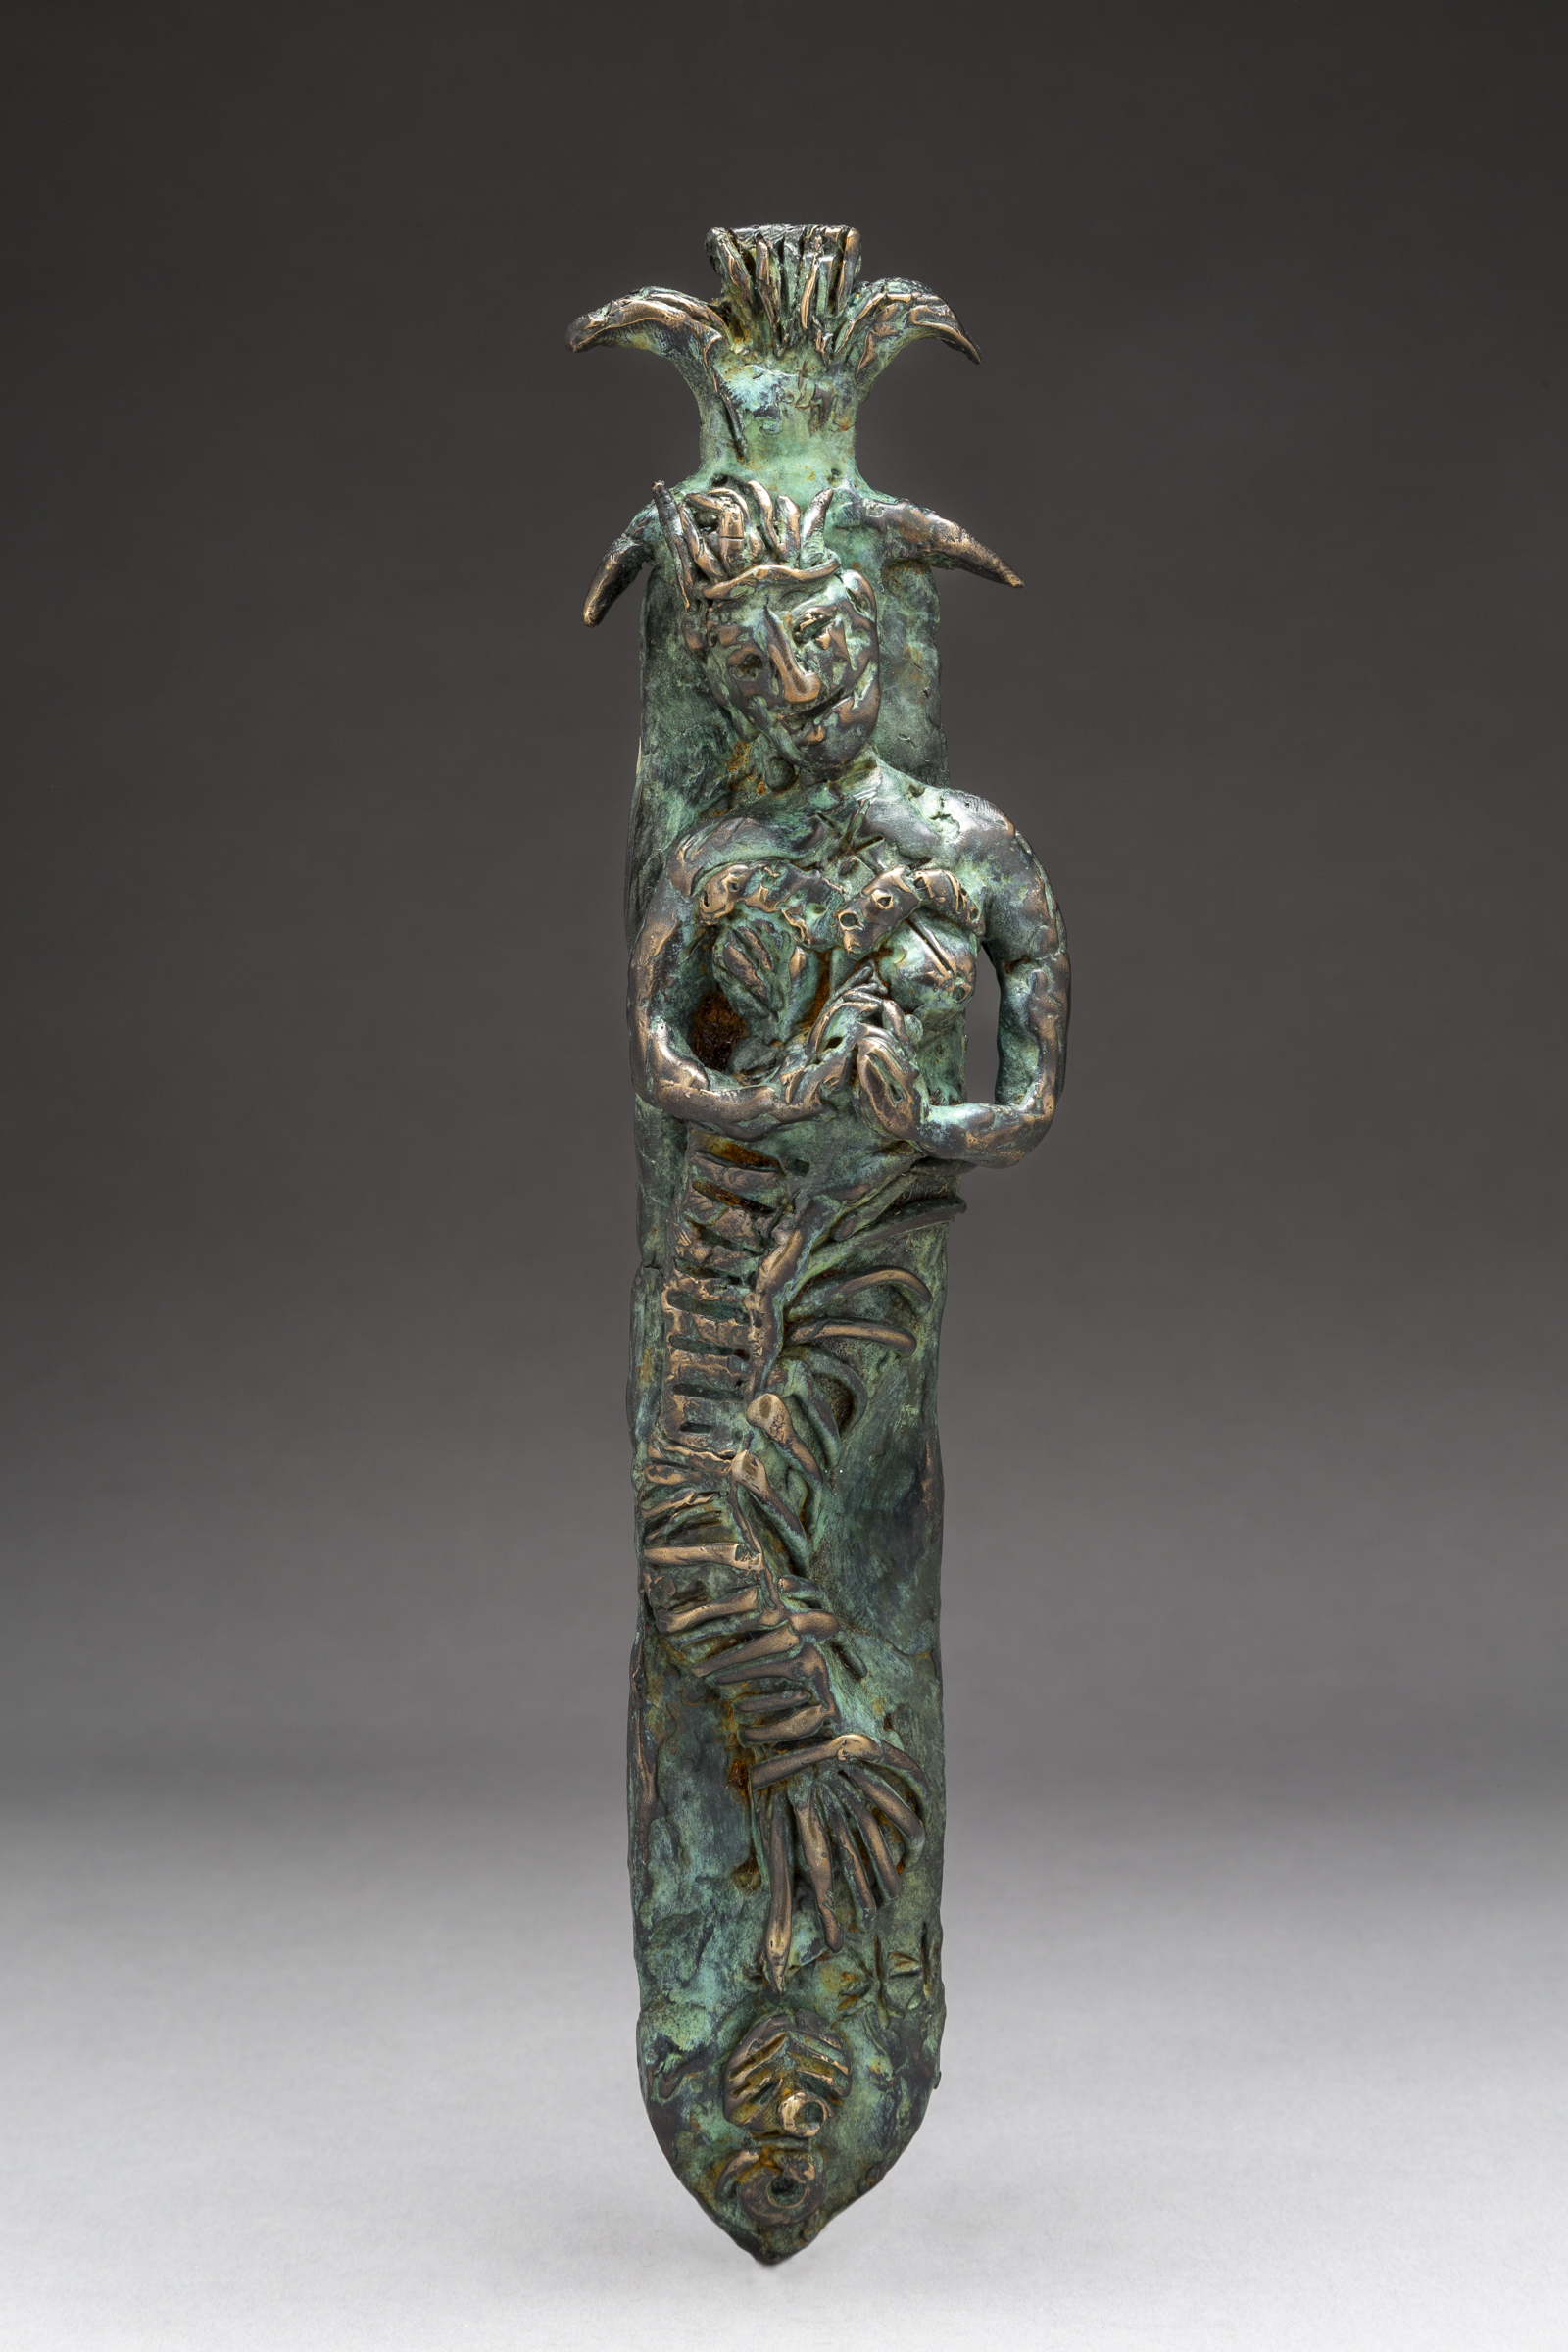 Mermaid Dagger